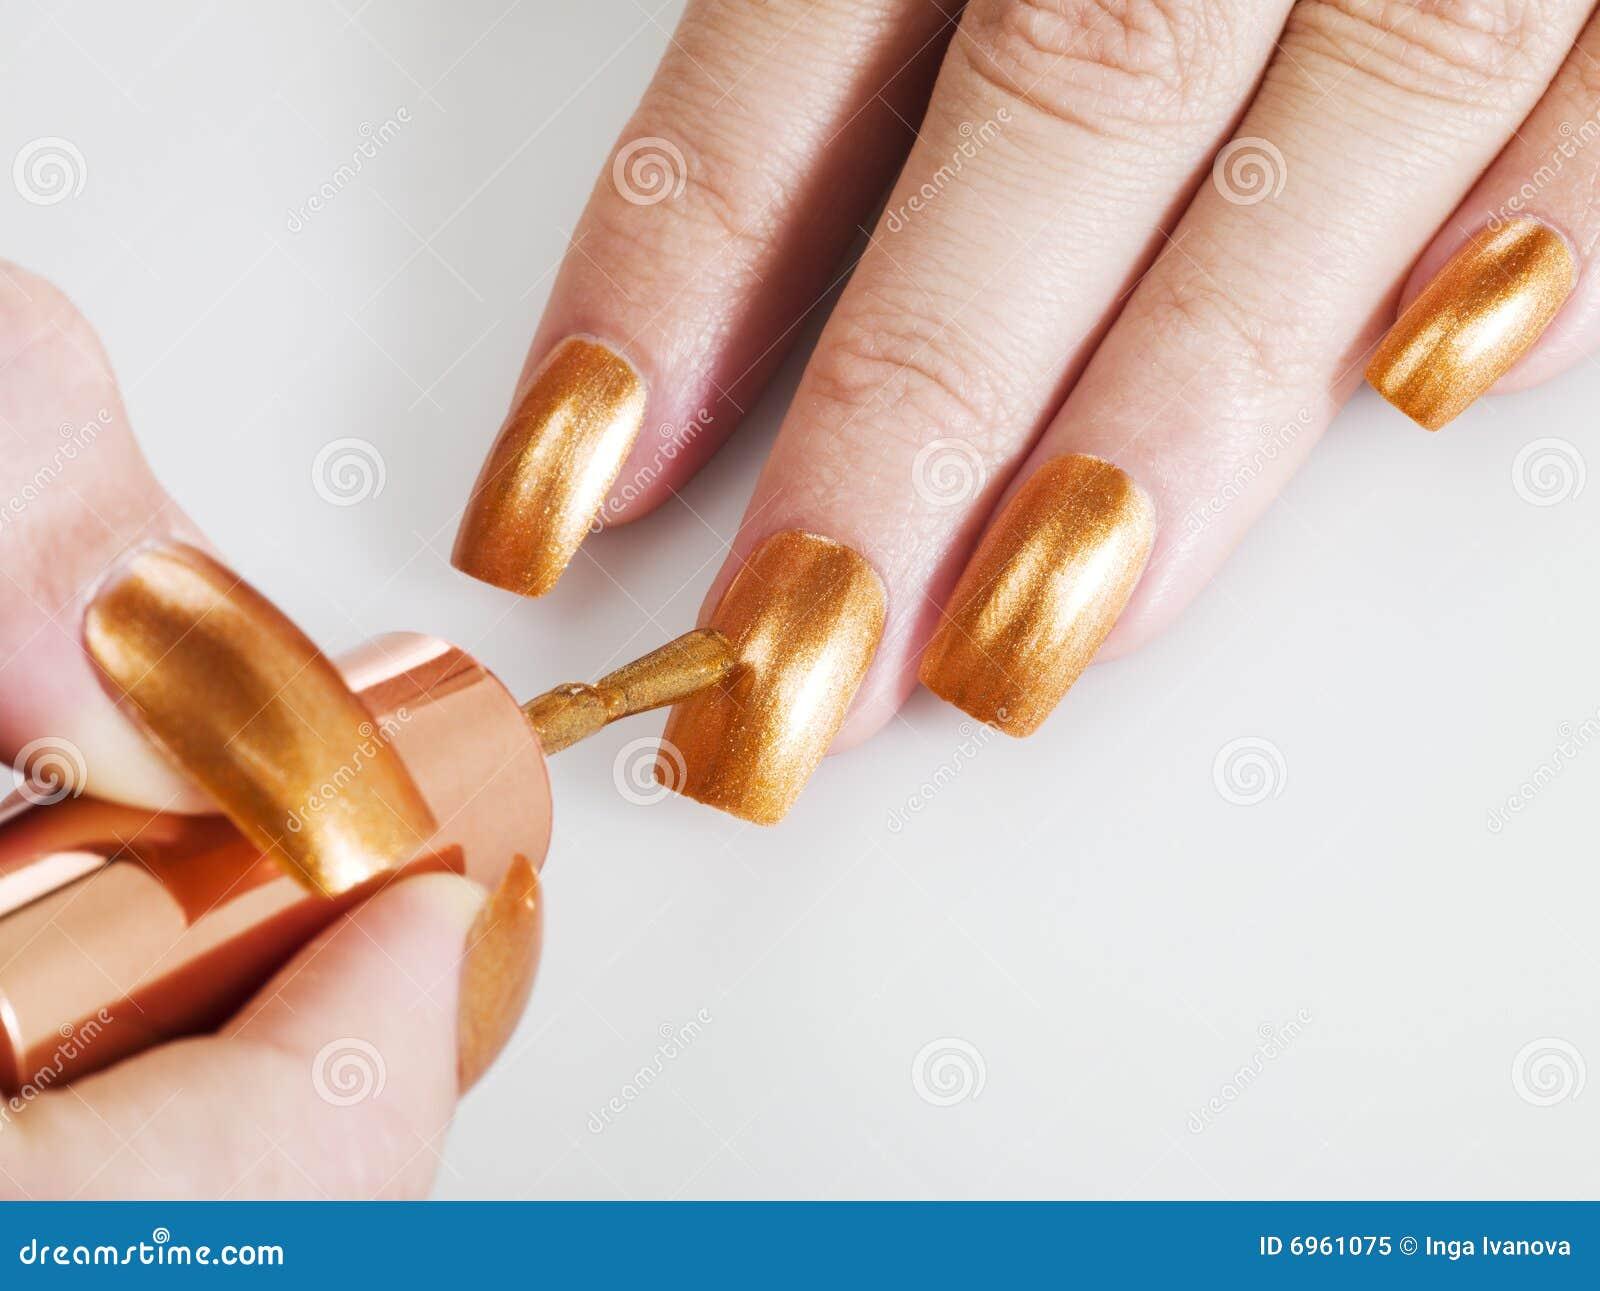 goldener nagellack lizenzfreies stockfoto bild 6961075. Black Bedroom Furniture Sets. Home Design Ideas